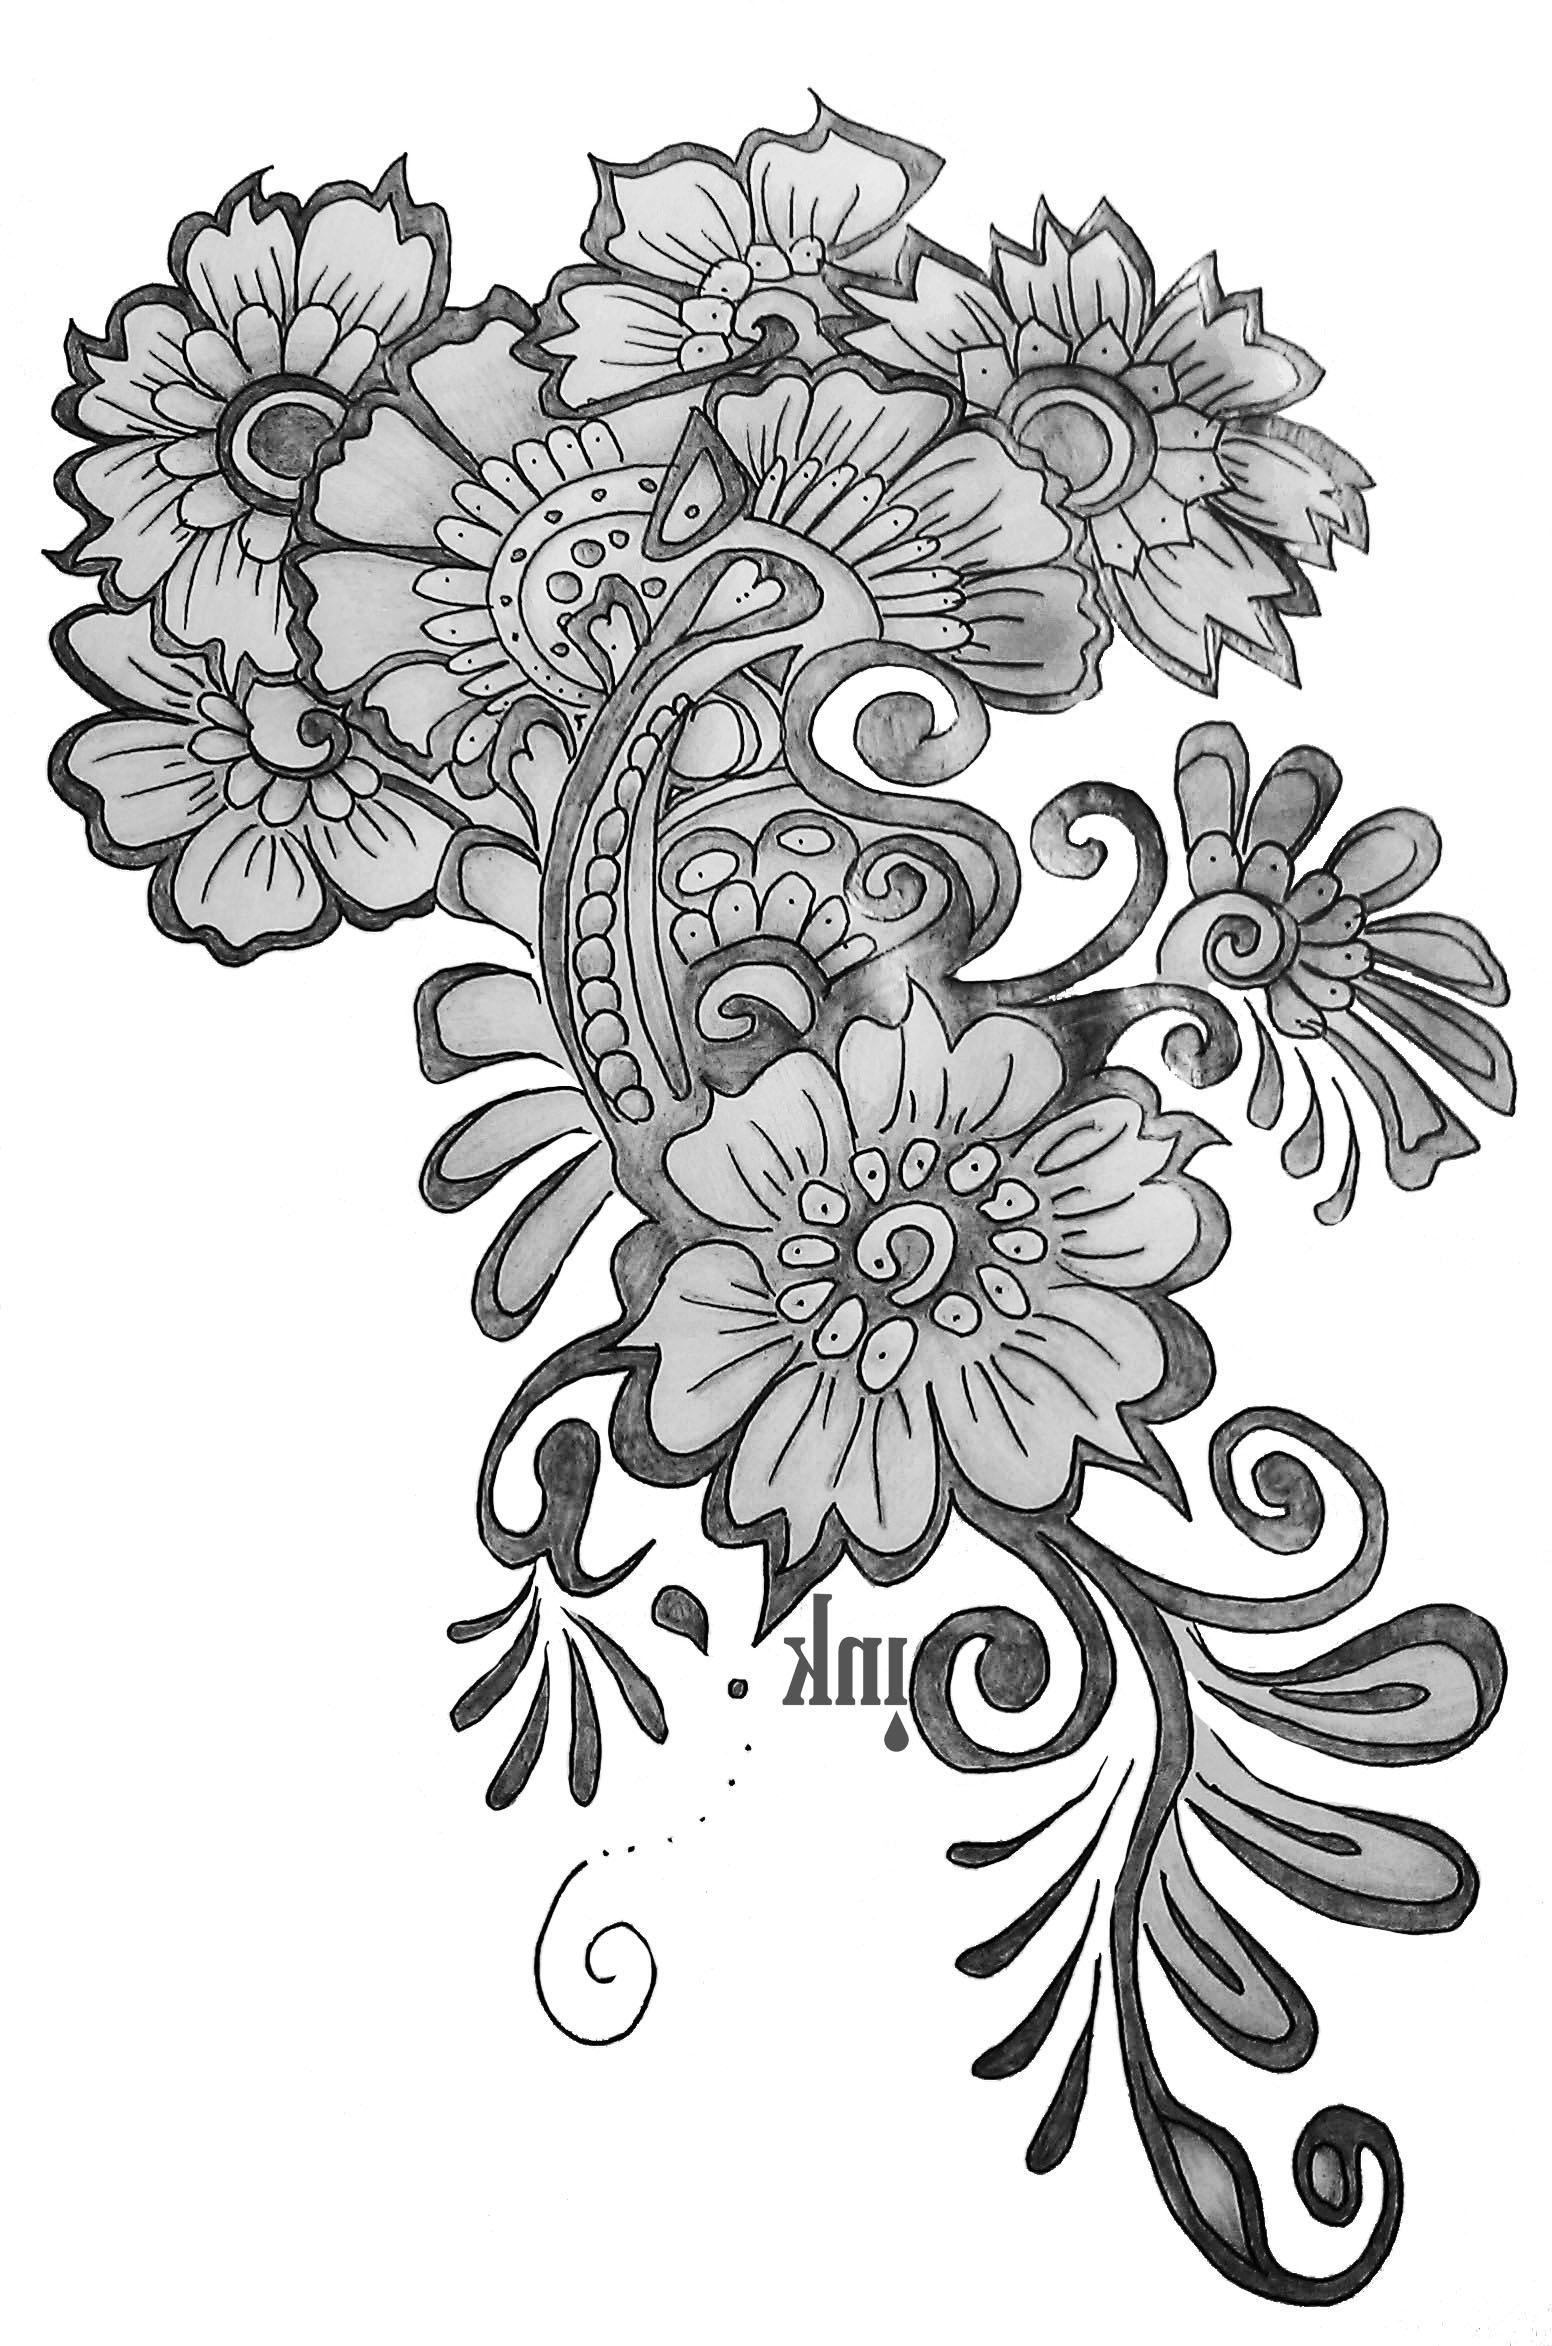 Flower designs for drawing at getdrawings free for personal 1552x2346 designs for pencil drawing pencil sketch of flower design altavistaventures Image collections